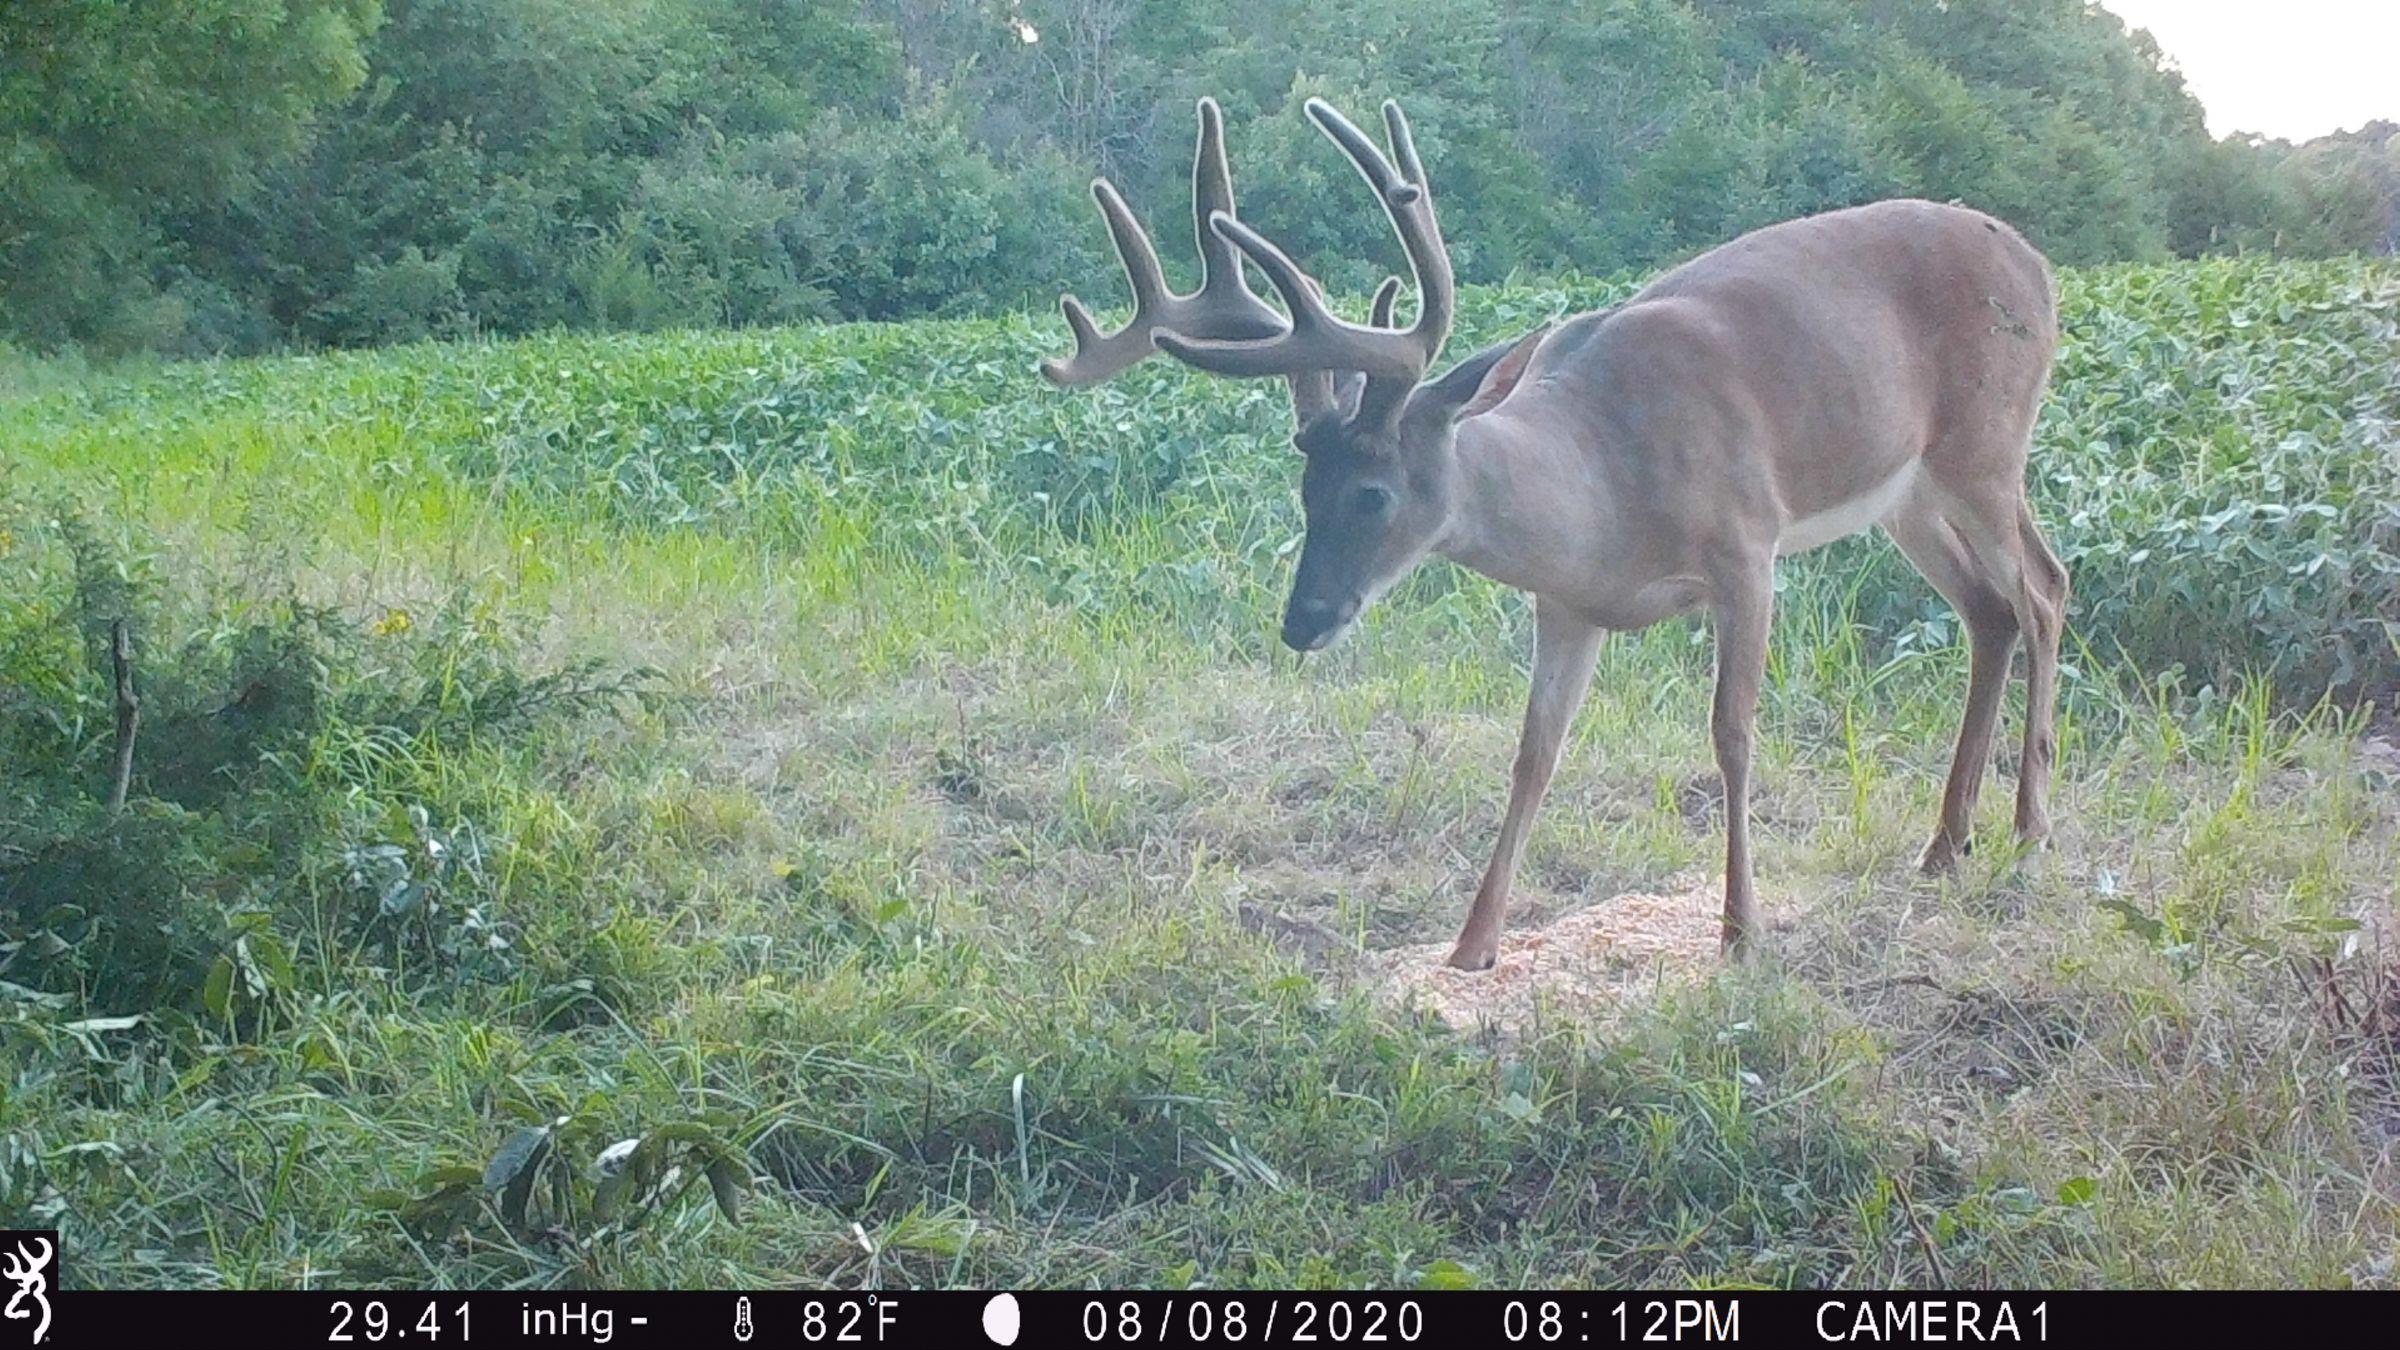 land-lee-county-iowa-328-acres-listing-number-15137-1-2020-08-27-175656.JPG